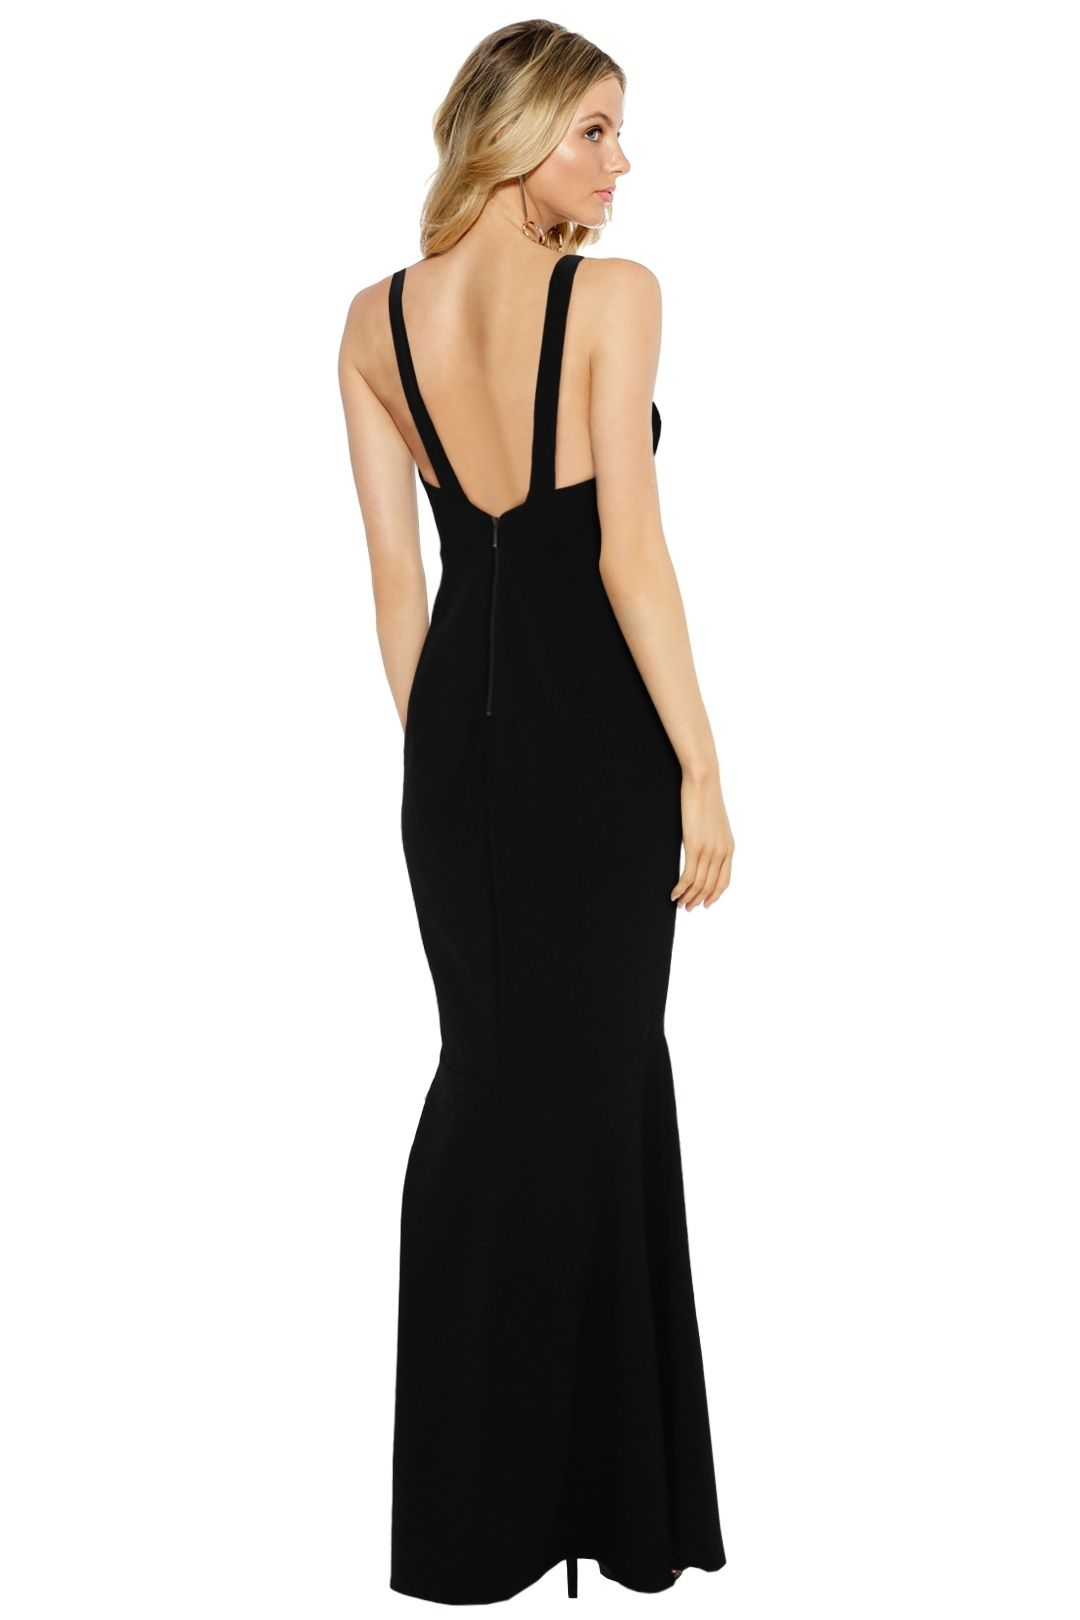 Sheike - Madrid Maxi Dress - Black - Back